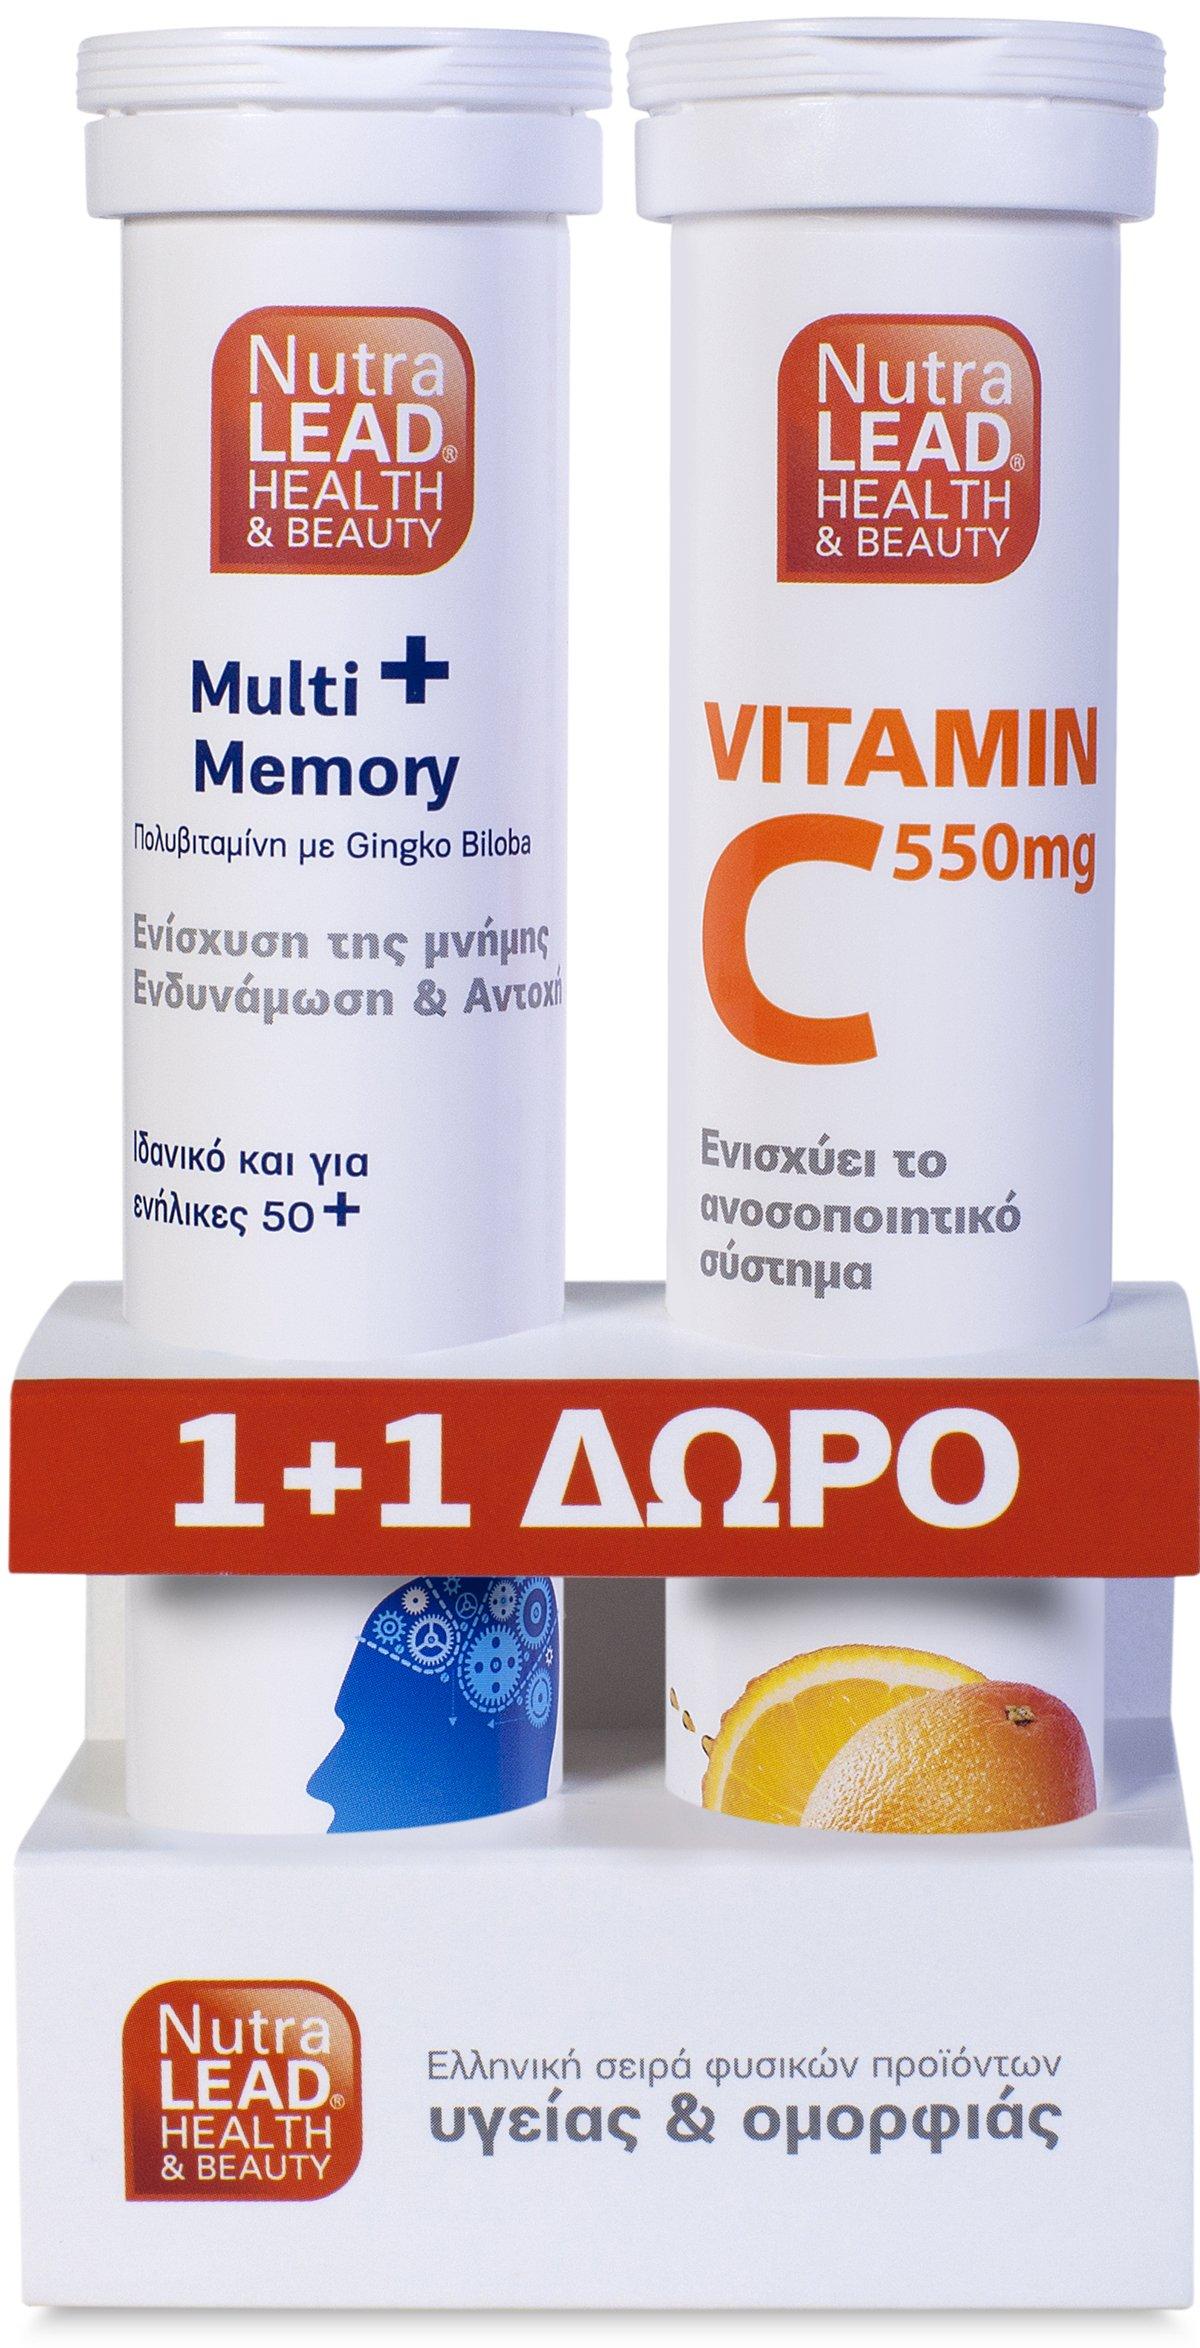 Nutralead Πακέτο Προσφοράς Multi+ Memory με Gingo Biloba 20Αναβρ.Δισκία + Βιταμίνη C 550mg – Πορτοκάλι 20Αν.Δισκία